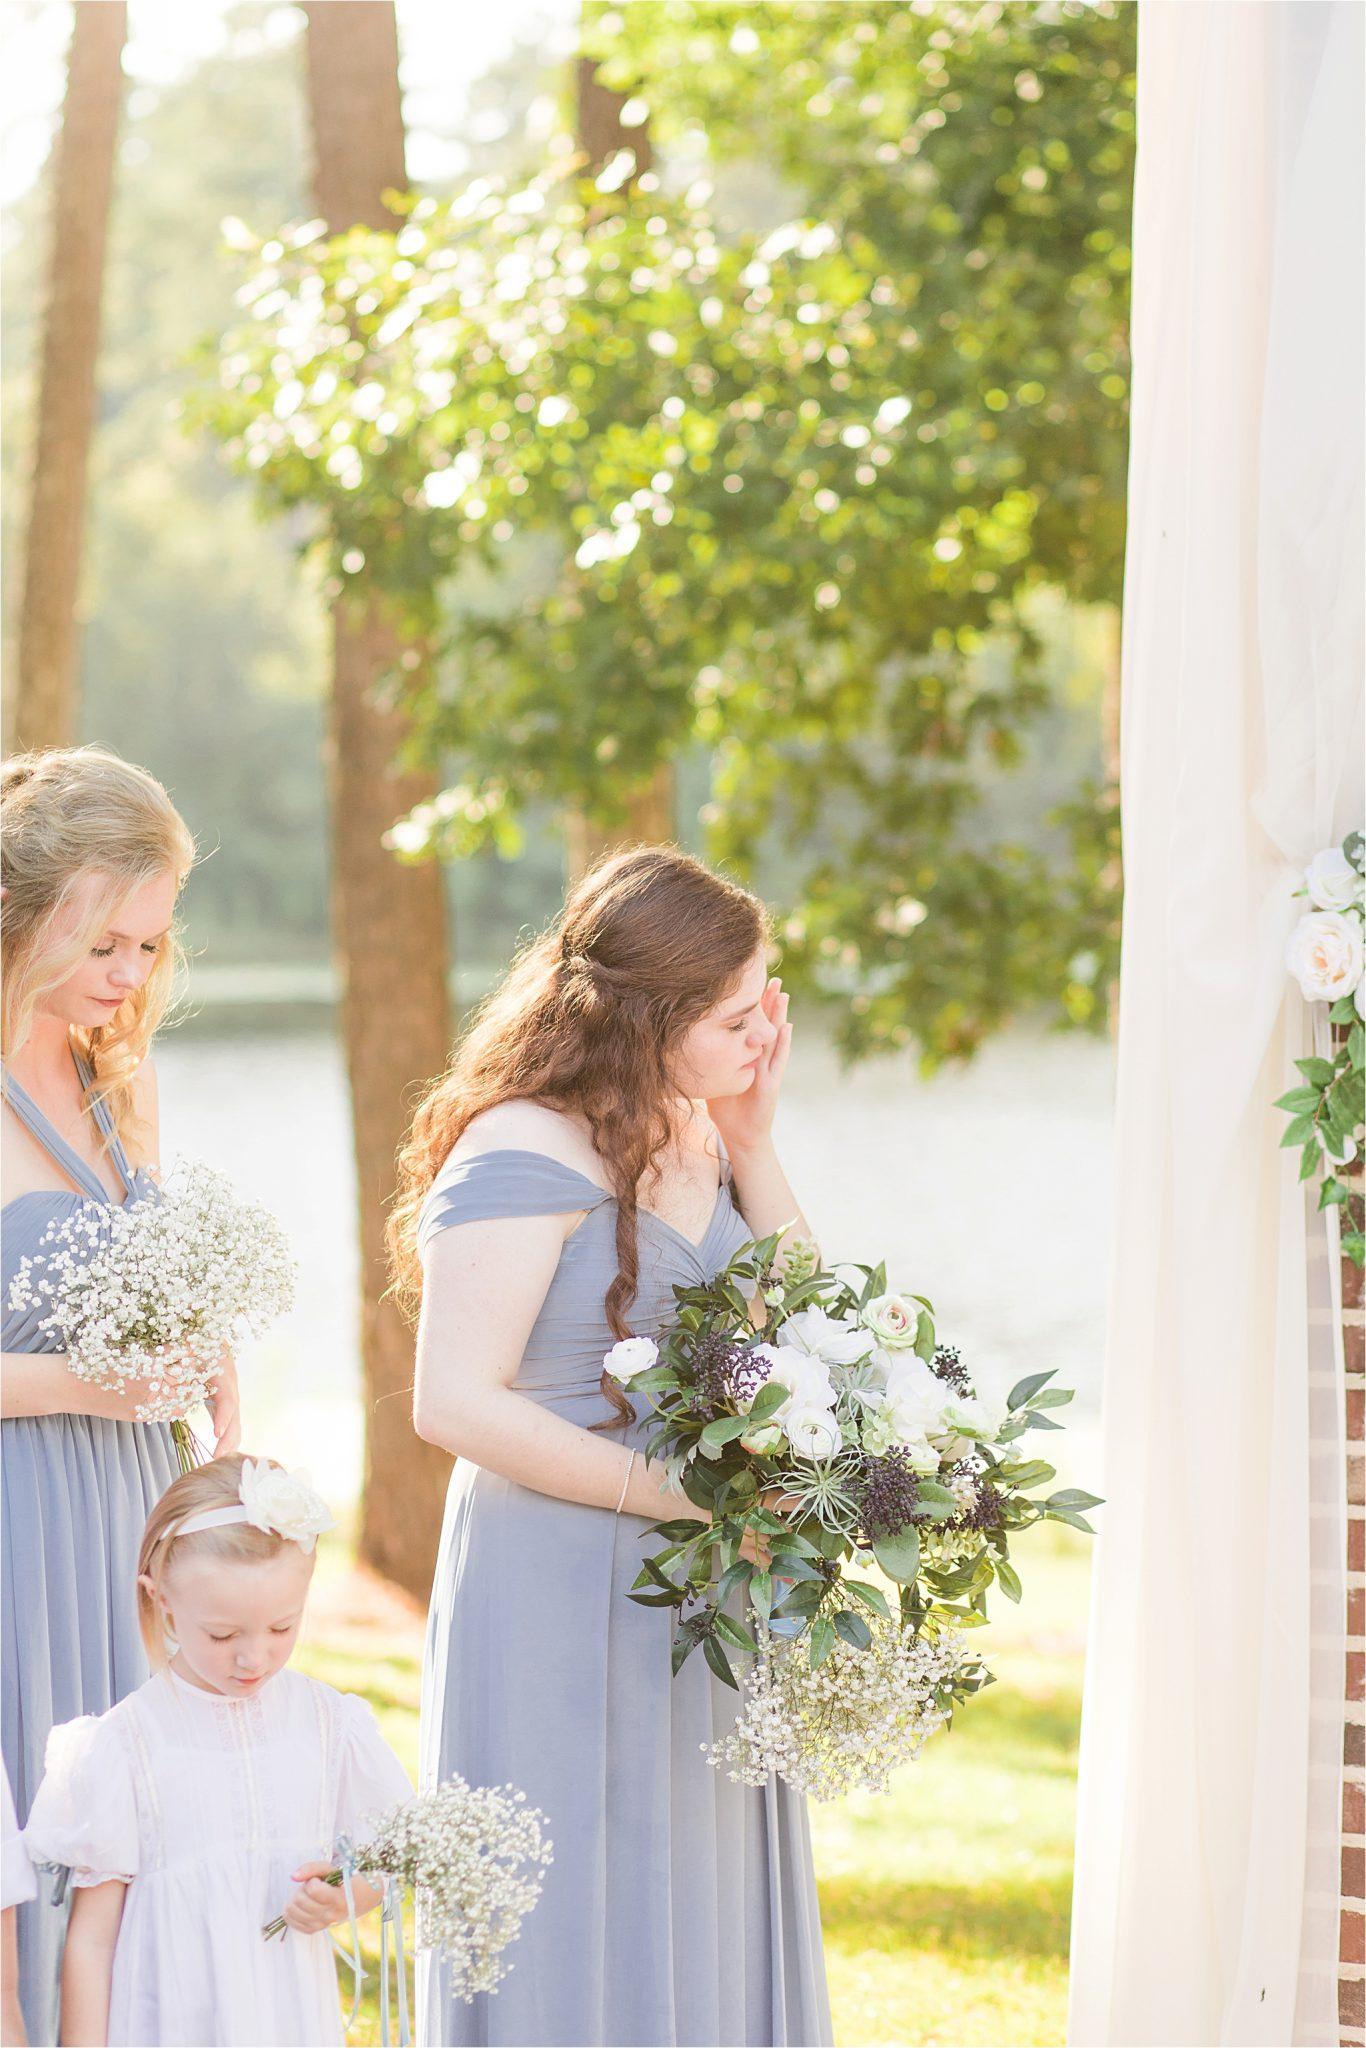 wedding-ceremony-dusty-blue-periwinkle-wedding-flower-girl-bridesmaids